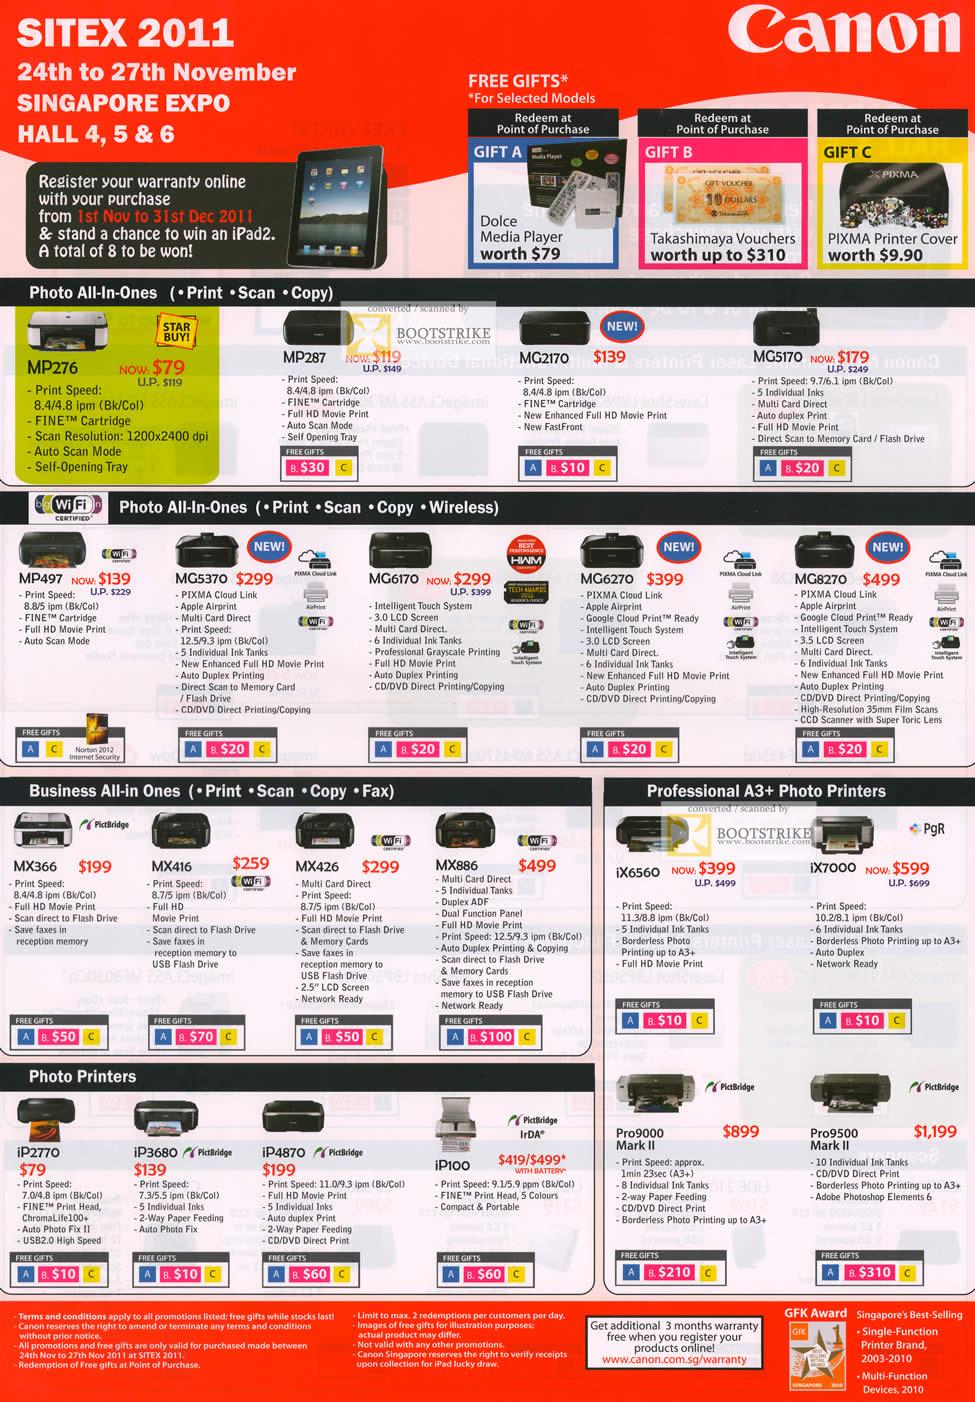 SITEX 2011 price list image brochure of Canon Inkjet Printers MP276, MP287, MG2170, MG5170, MP497, MG5370, MG170, MG6270, MG8270, MX366, MX416, IX7000, IP2770, IP3680, IP4870, IP100, Pro9000 Mark II, Pro9500